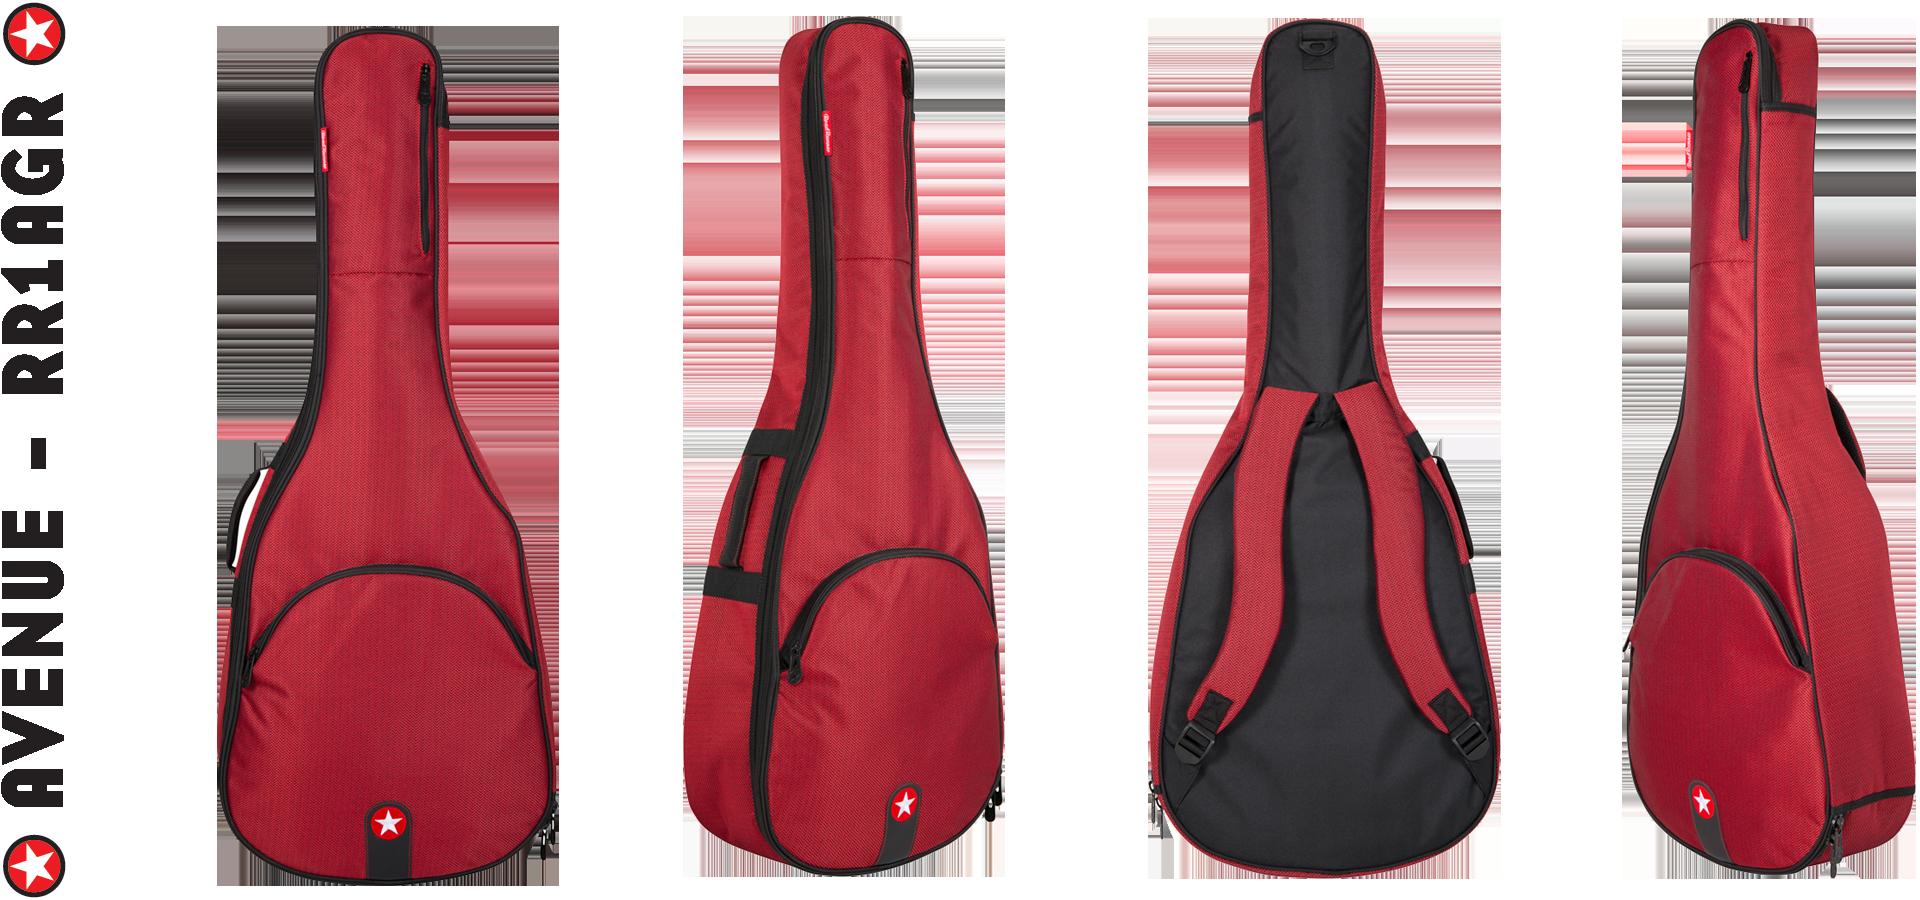 Road Runner RR1AGR Red Tweed Acoustic Guitar Gig Bag